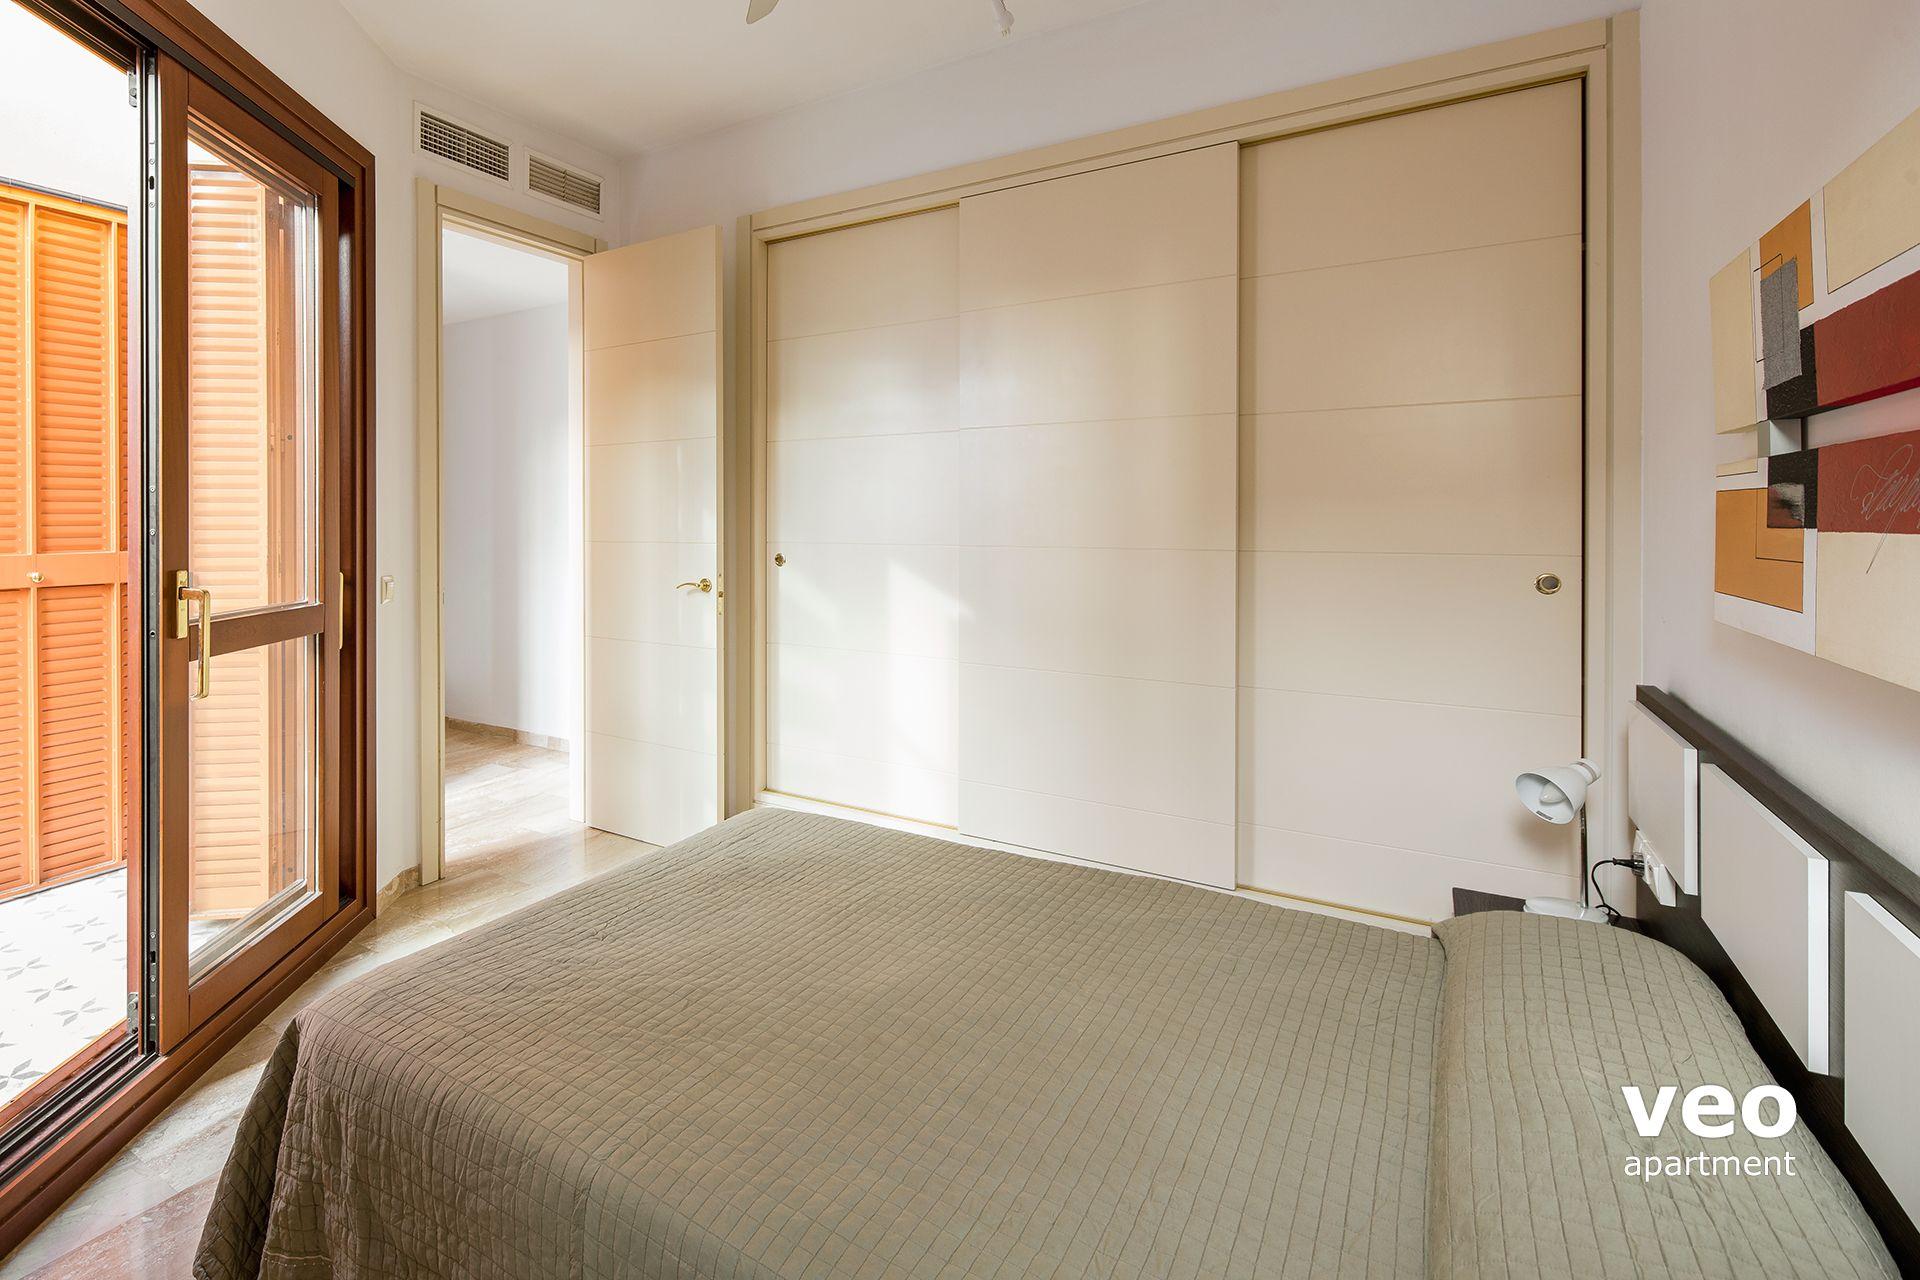 Seville Bedroom Furniture Seville Apartment Pajaritos Street Seville Spain Pajaritos 1